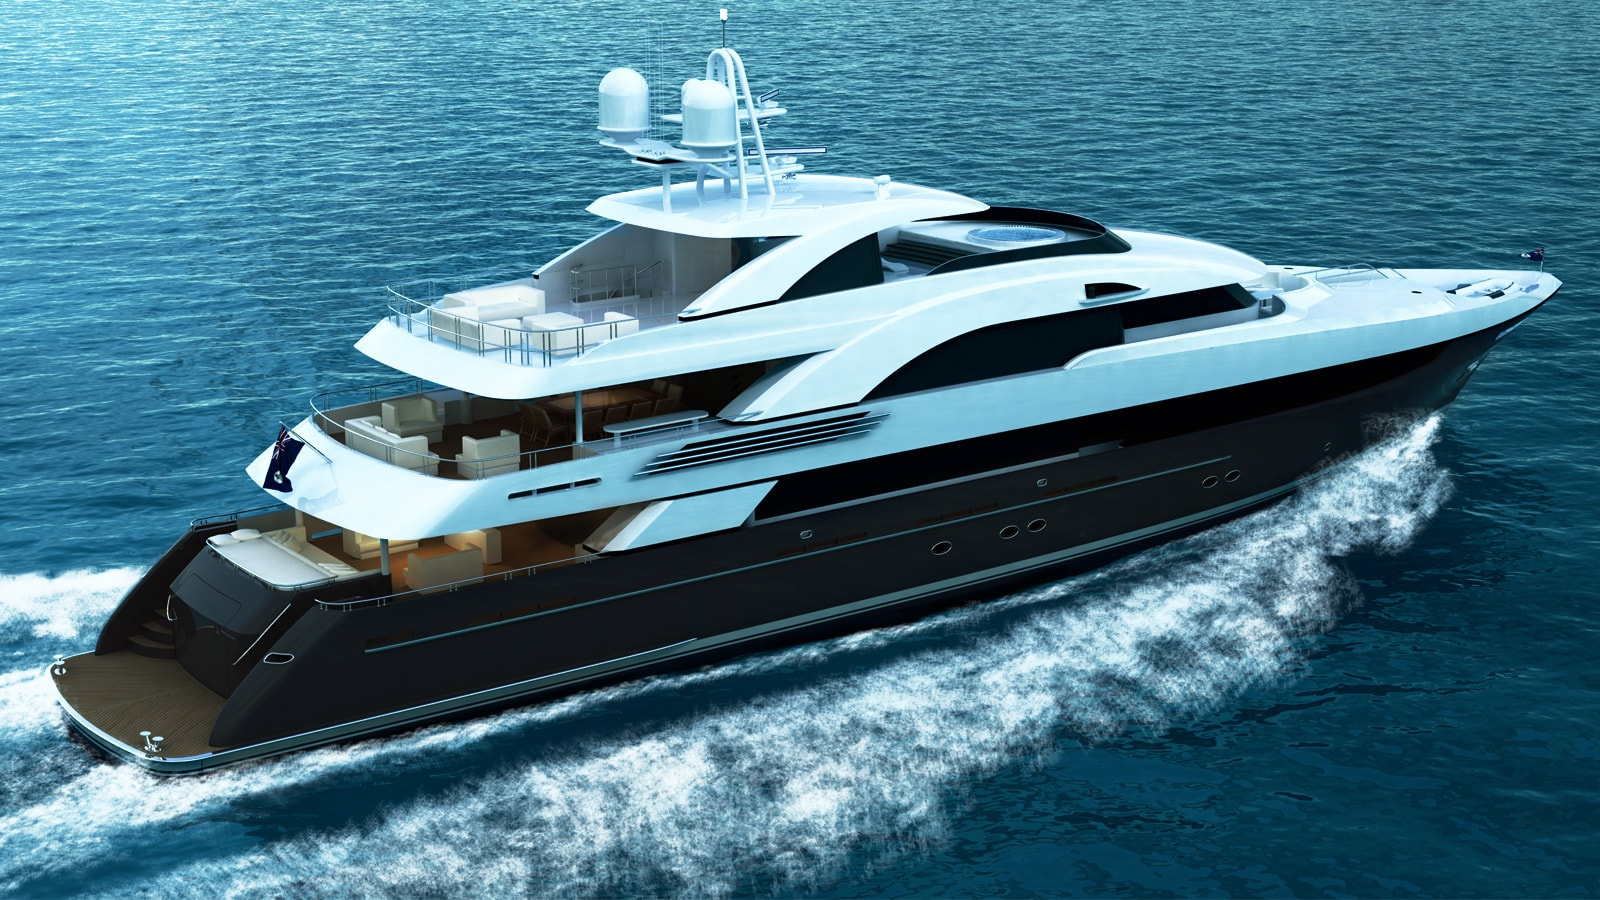 Trinity 51 Luxury Yacht For Sale Iyc